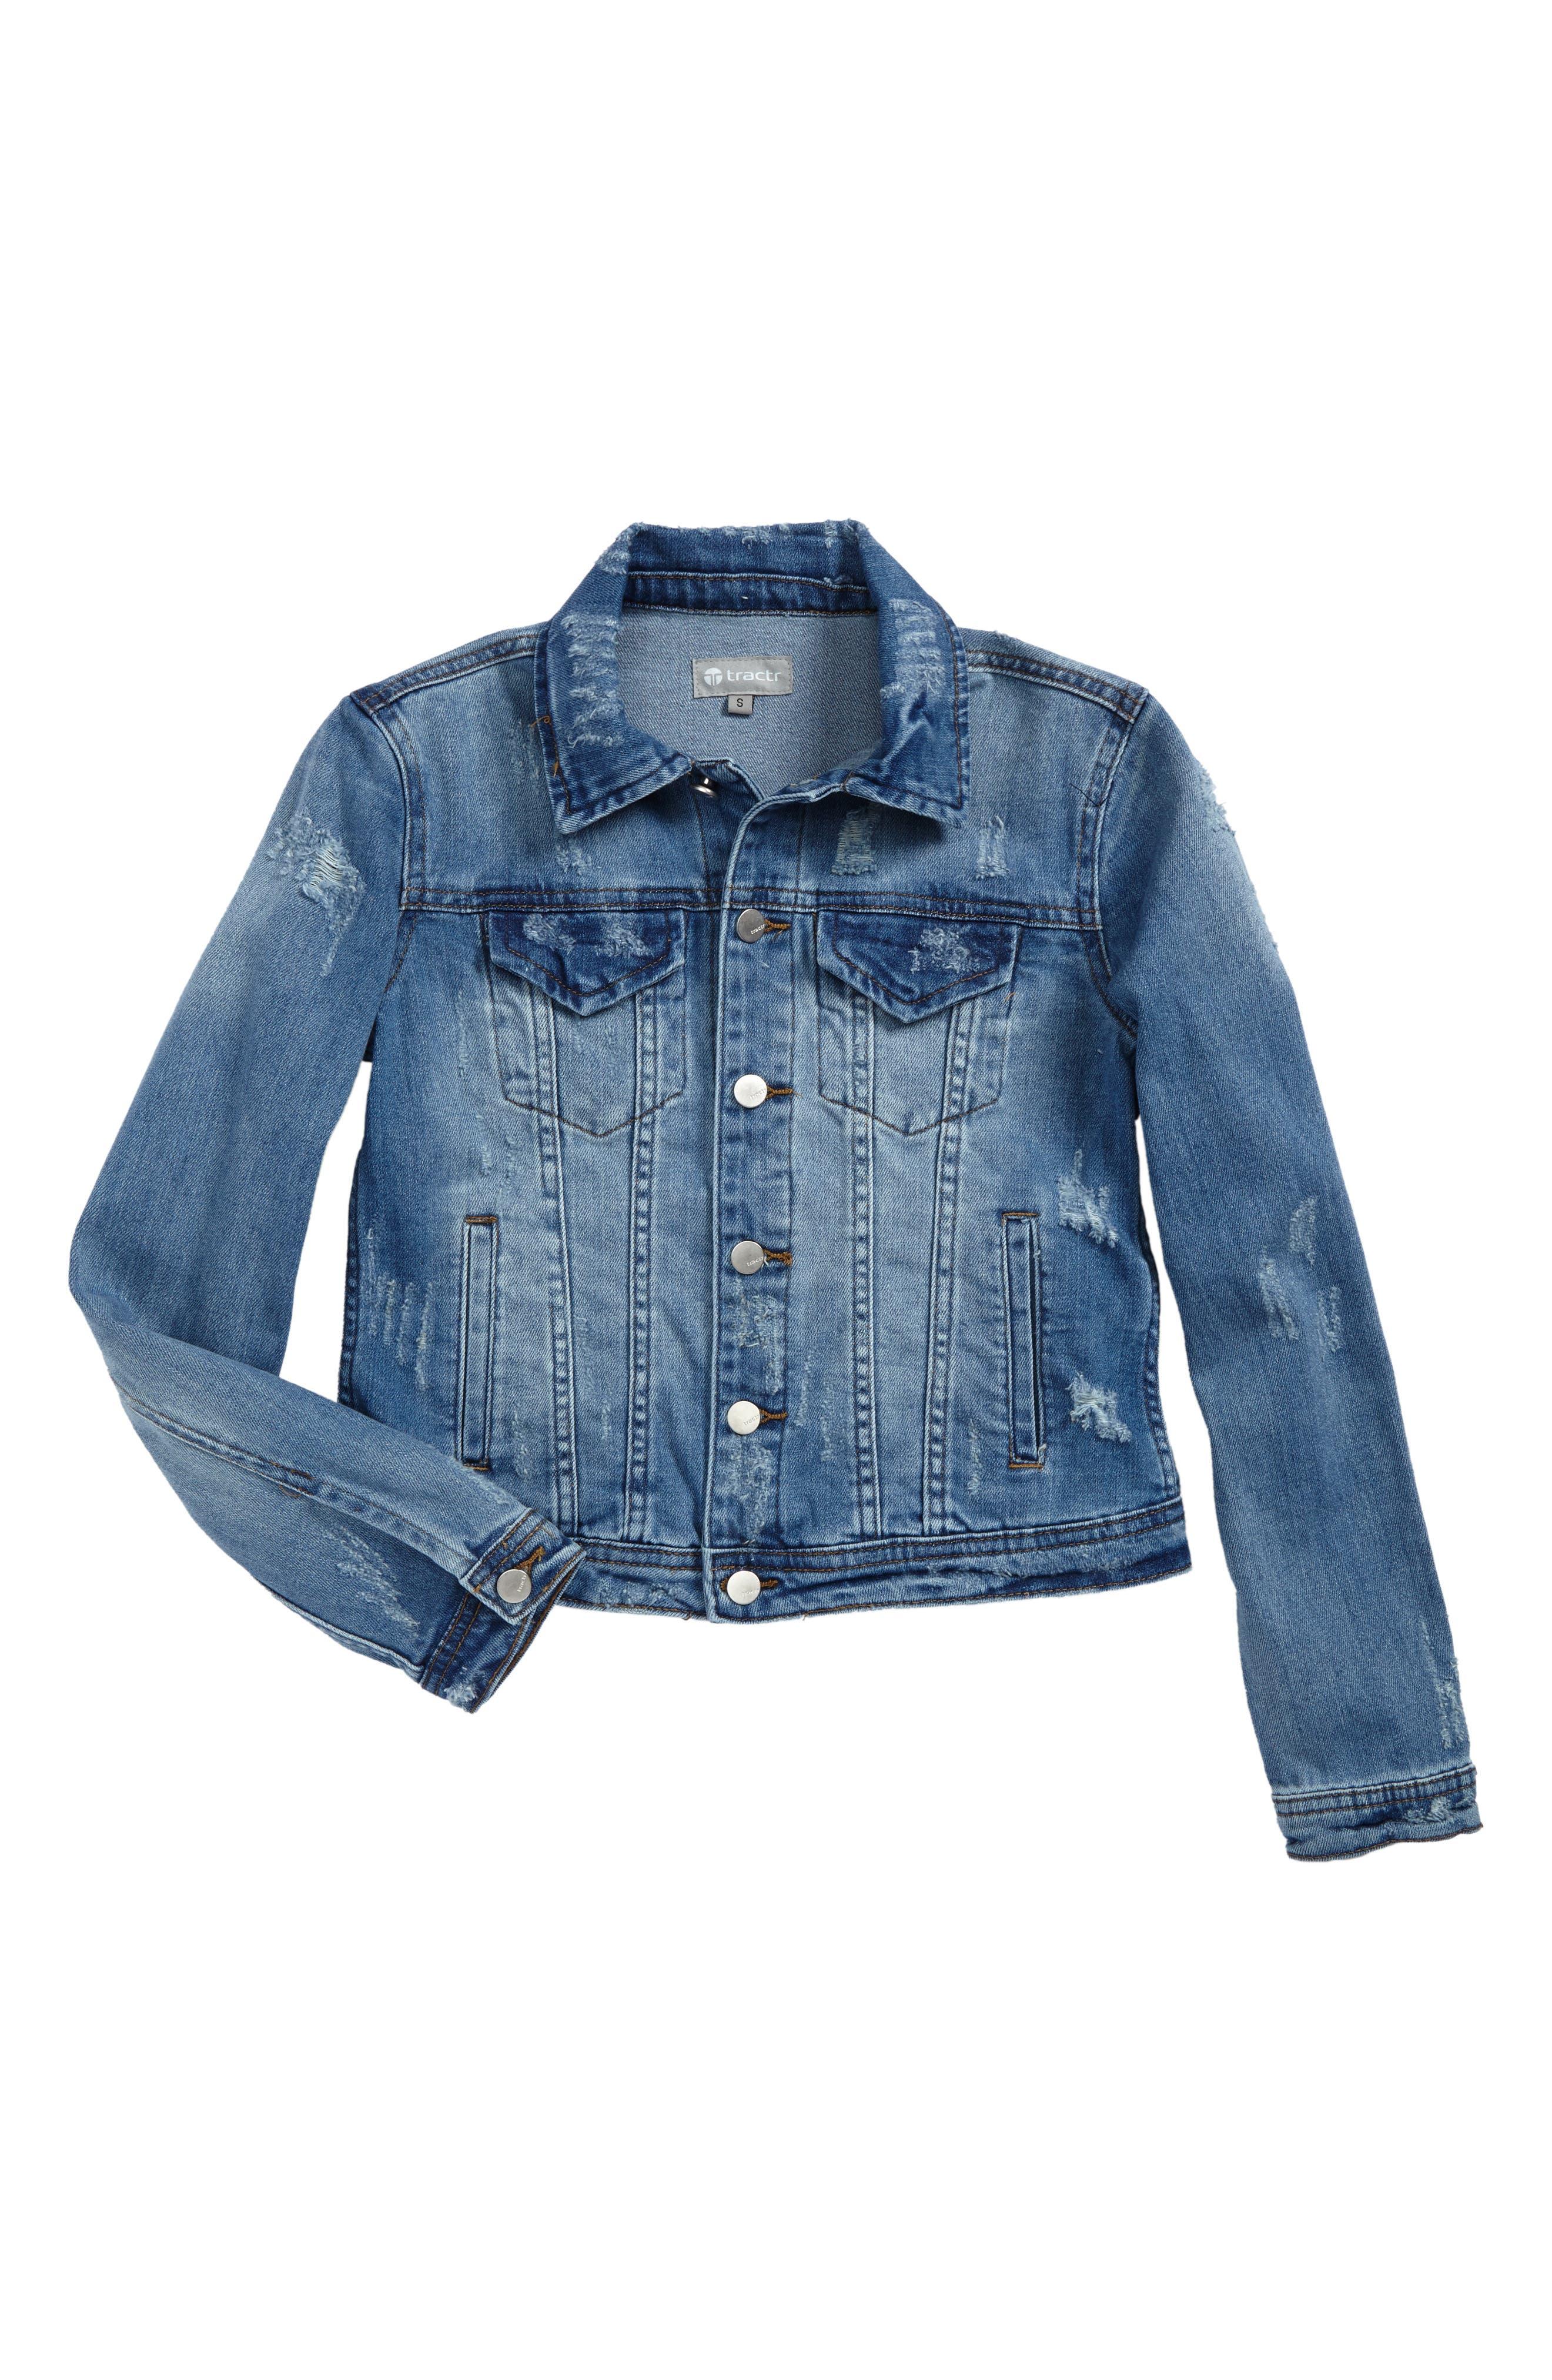 Decon Denim Jacket,                         Main,                         color, 407